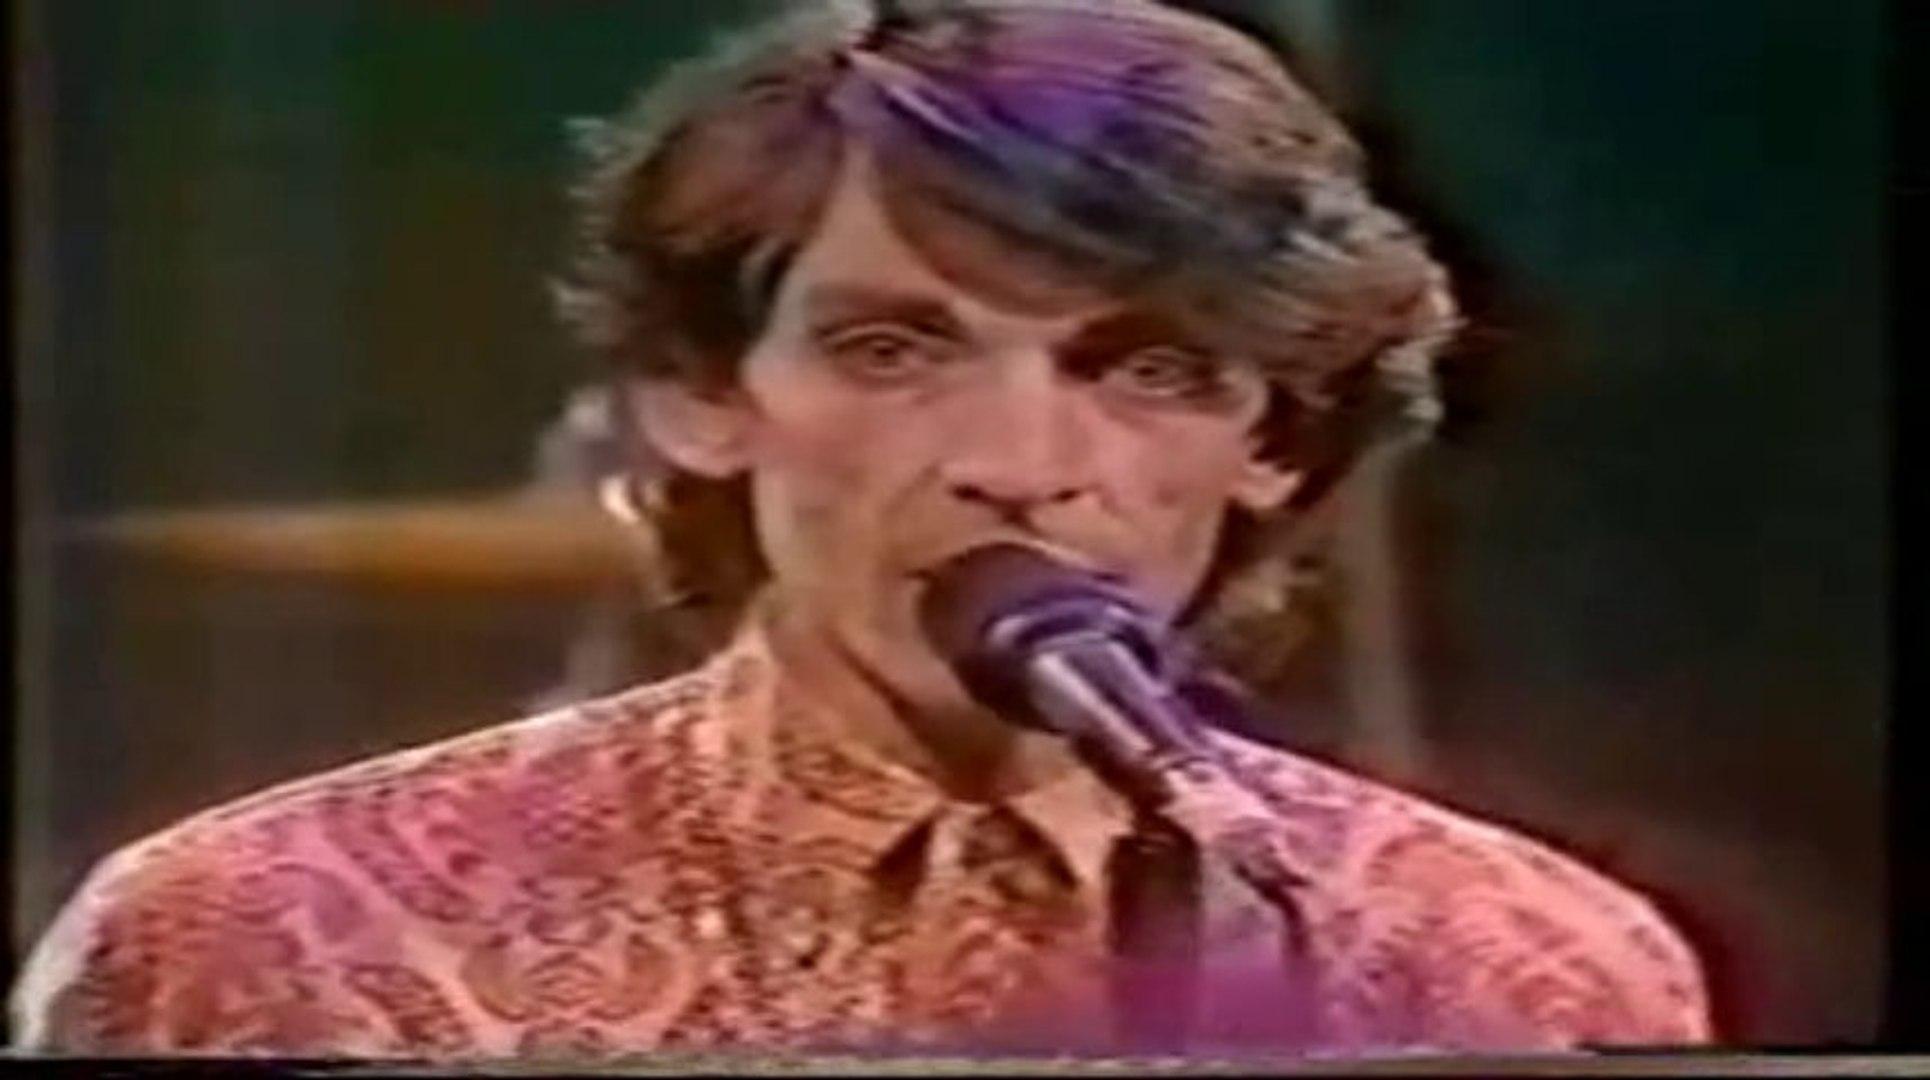 FEDERICO MOURA - MINIRECITAL BADIA & CIA AÑO 1986 - DAILYMUSIC CONCERT